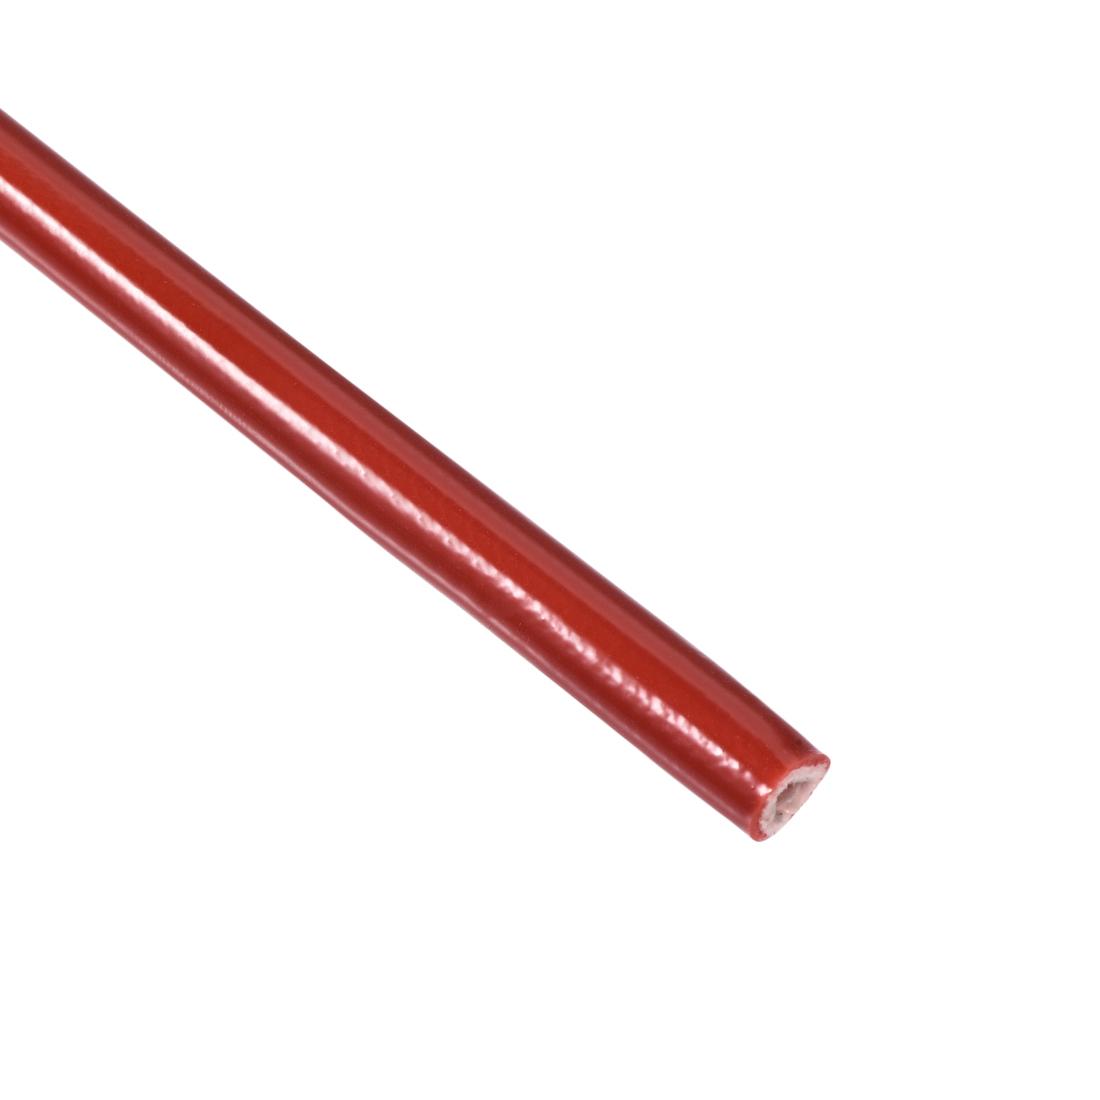 Silicone Rubber Fiberglass Retardant Self-extinguishing Sleeving 4mmx1M RoHS Red